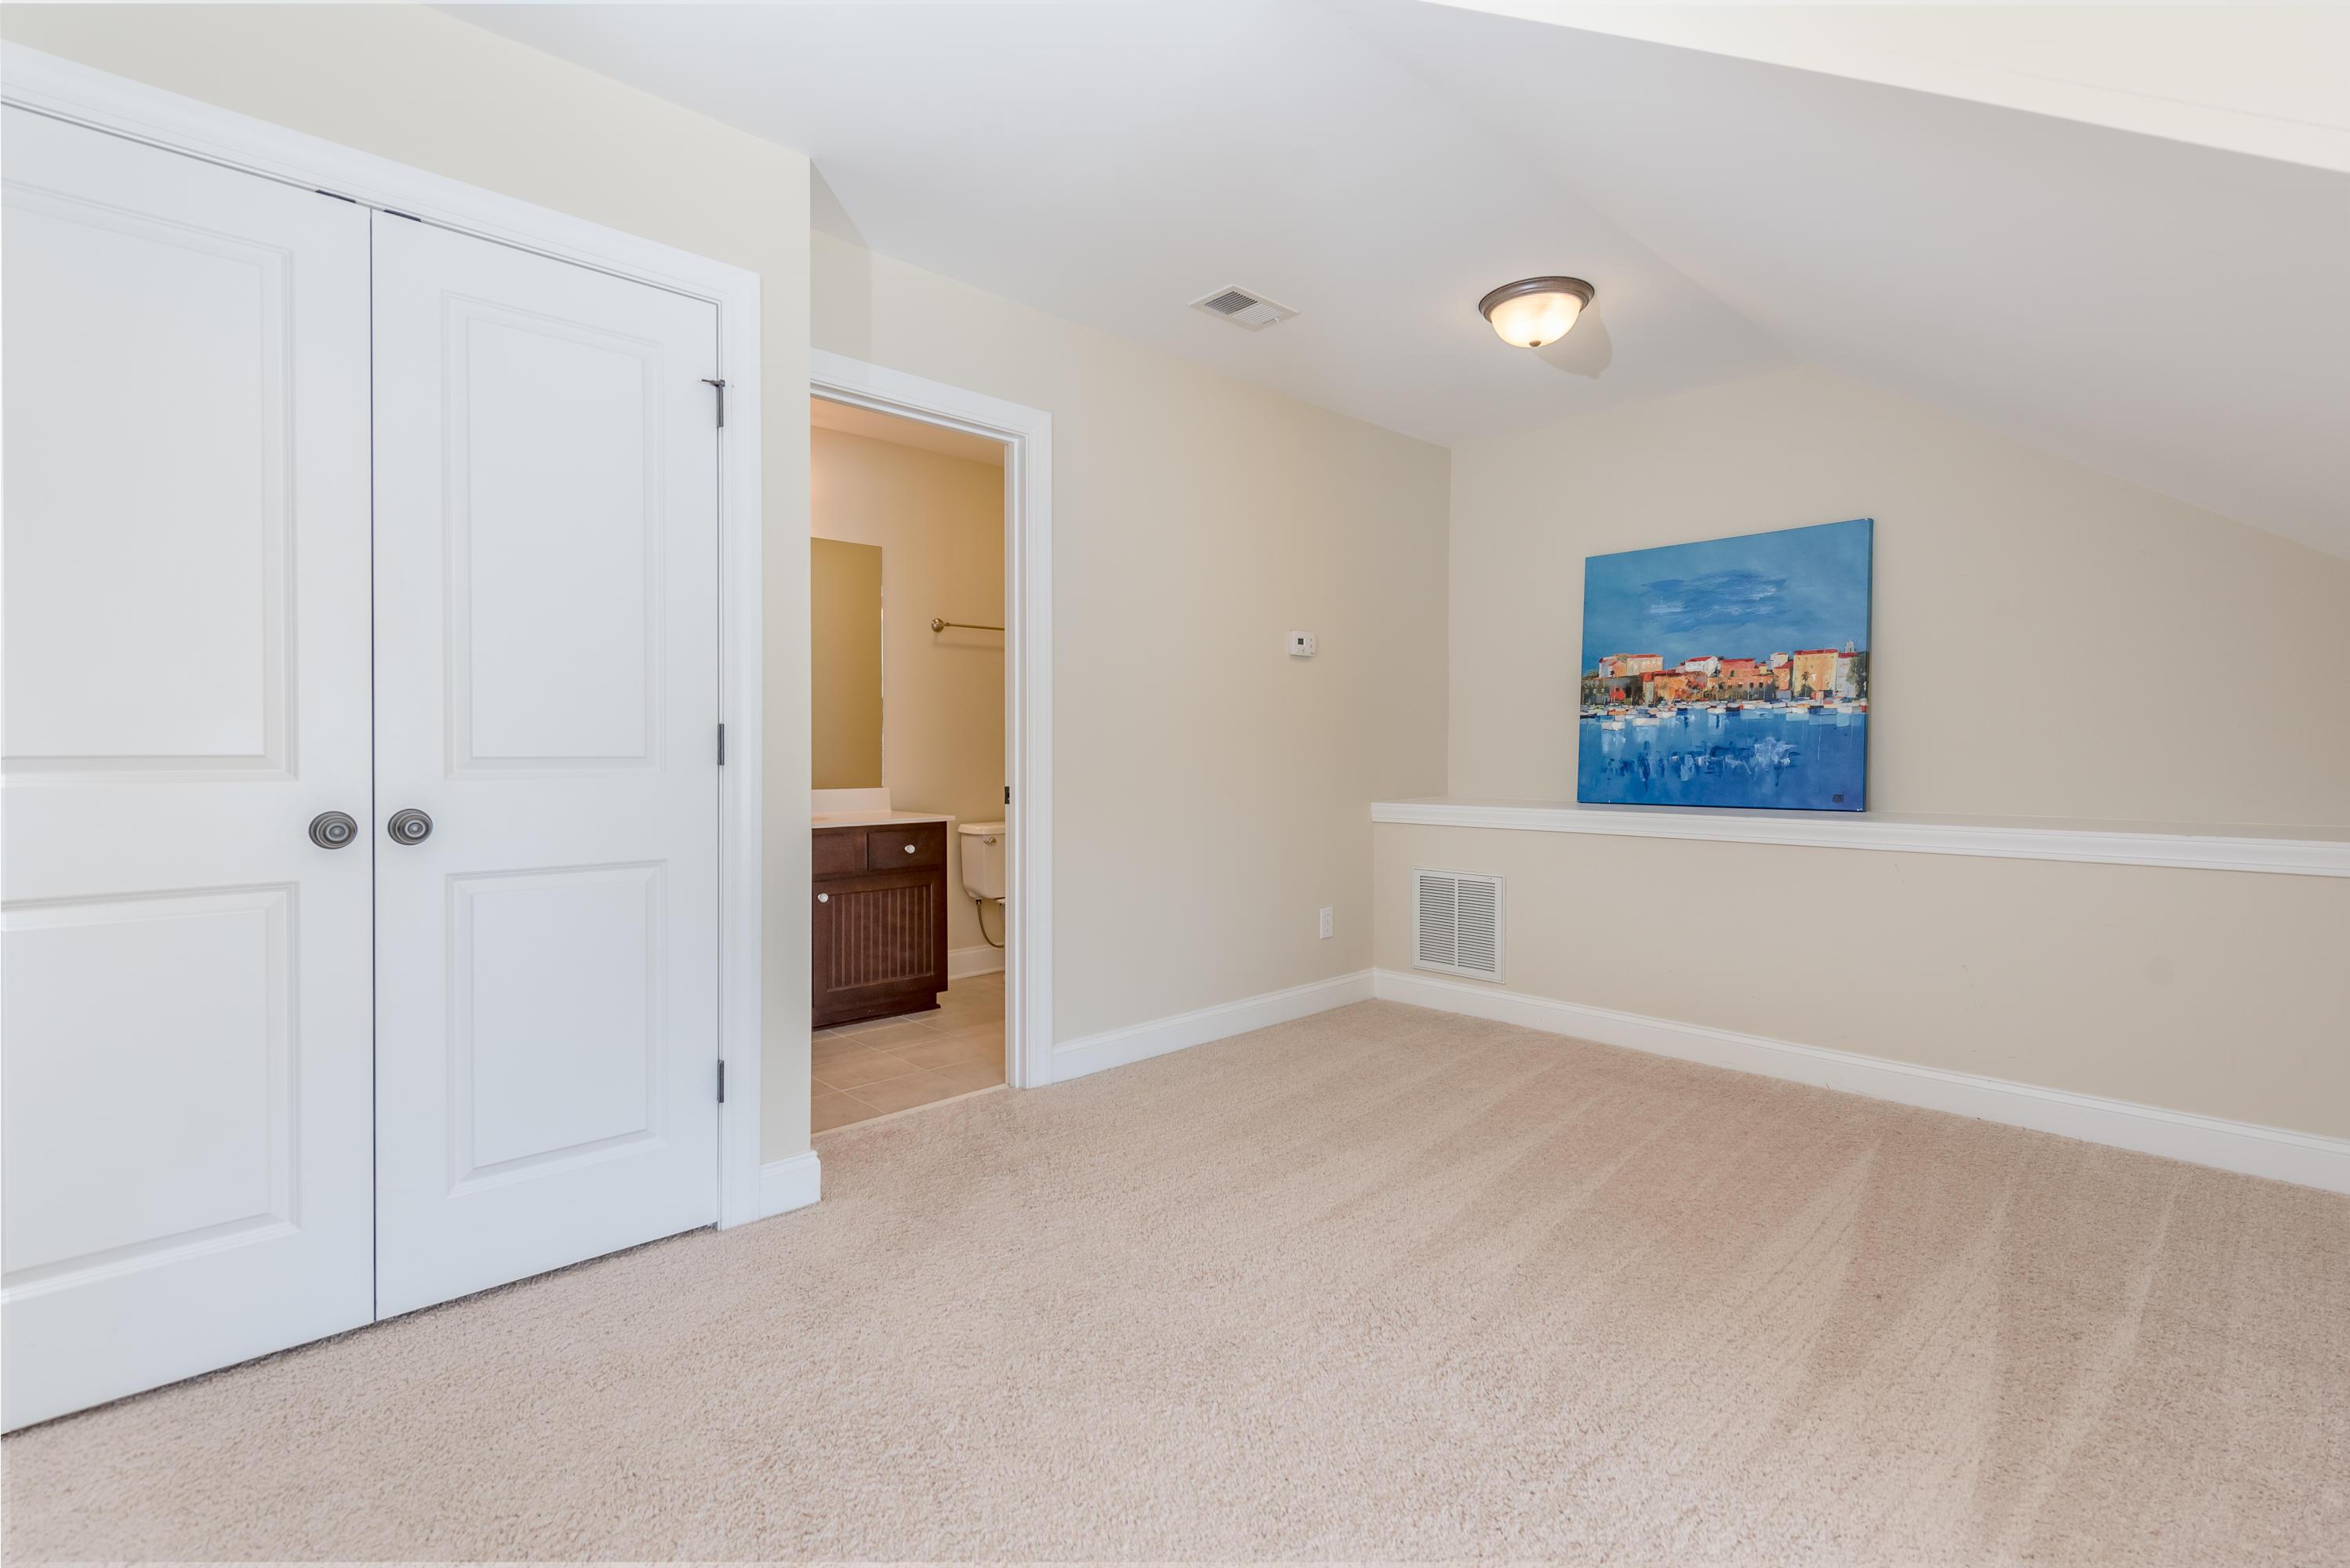 Hamlin Plantation Homes For Sale - 4245 Coolidge, Mount Pleasant, SC - 29